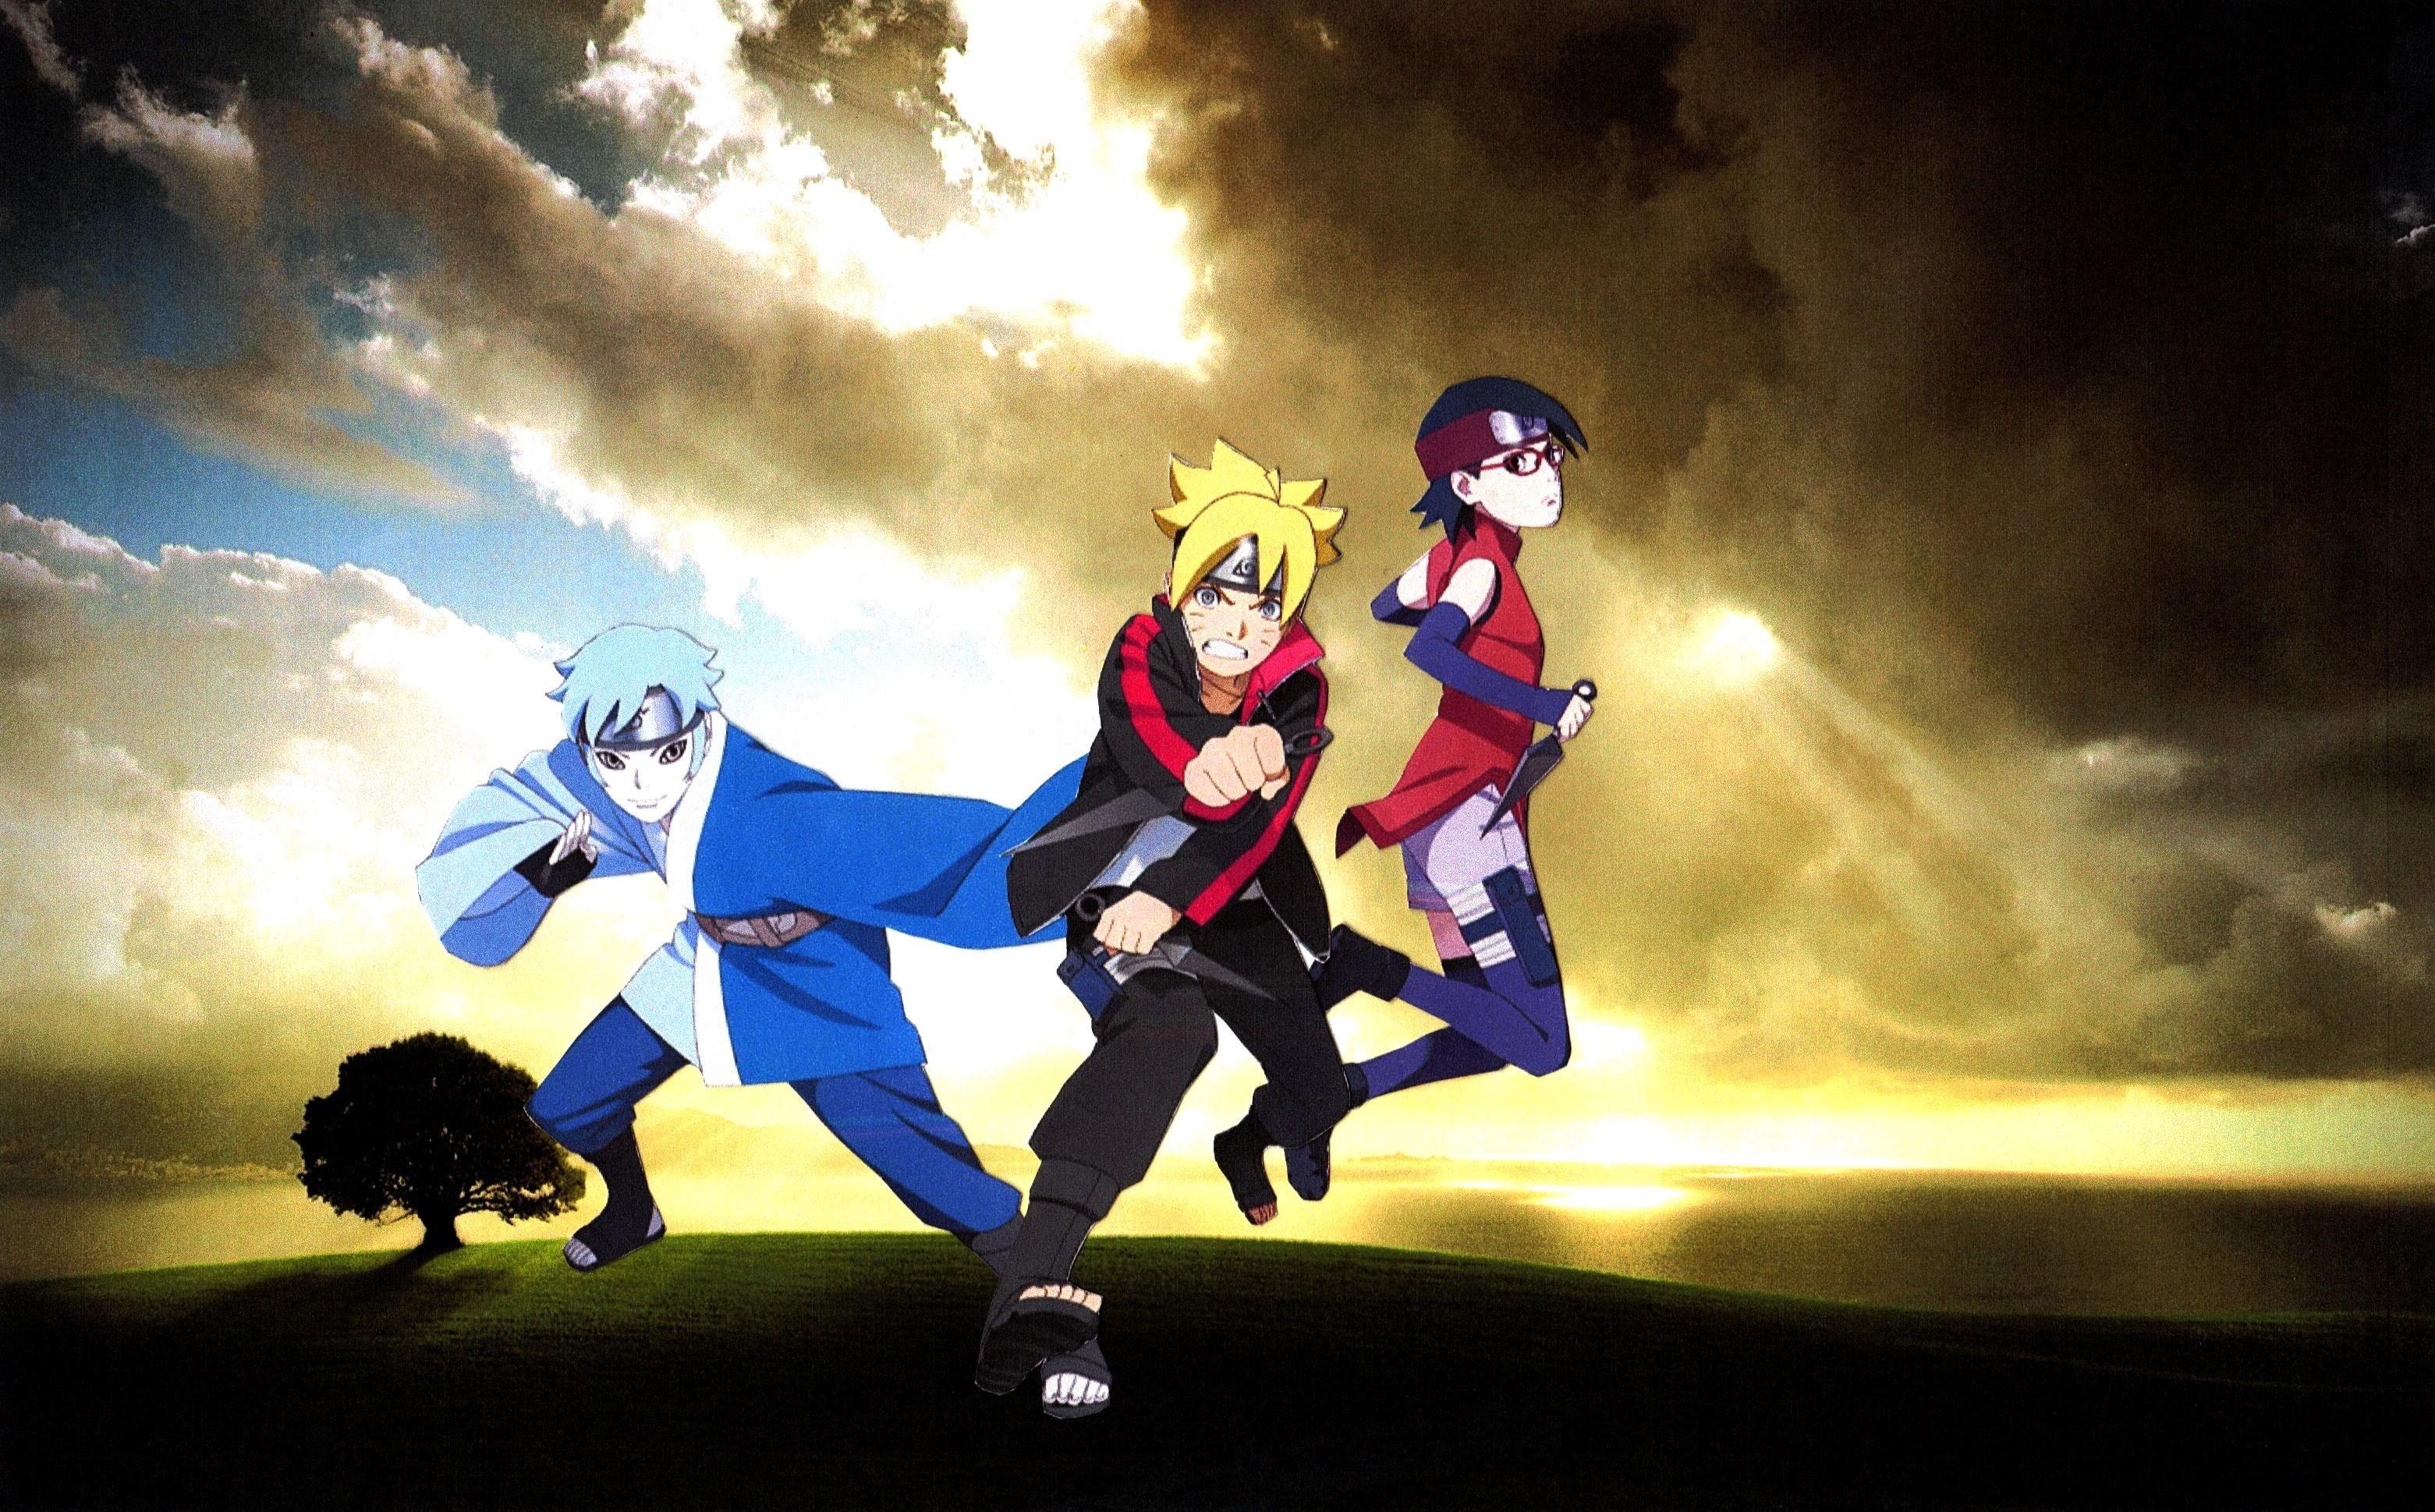 Gambar Anime Boruto Hd - Gambar Anime Keren